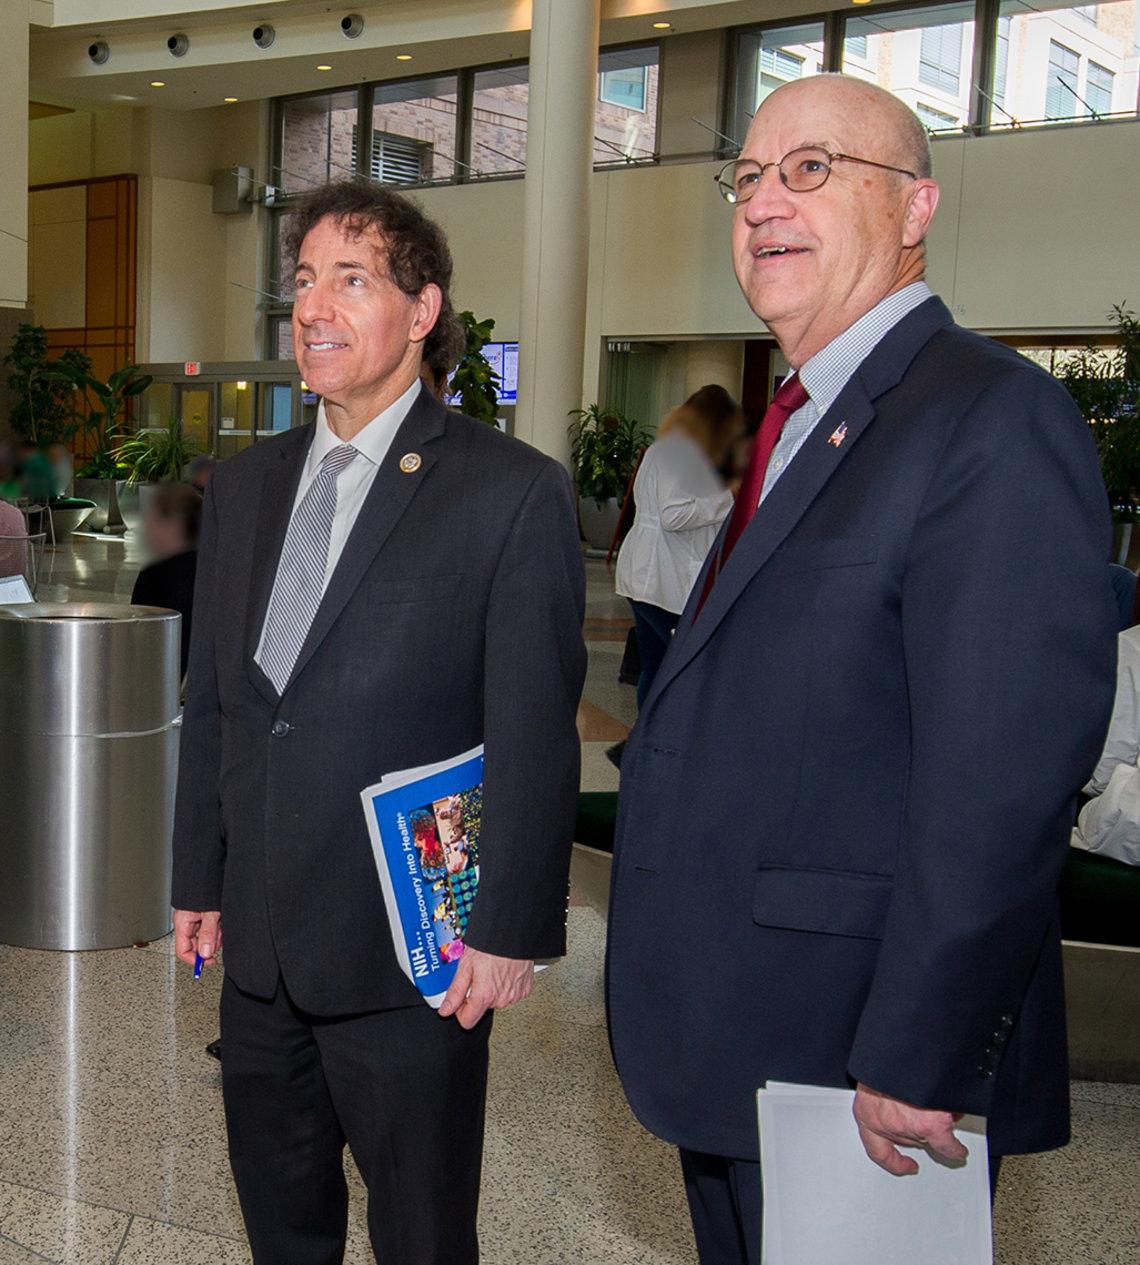 Raskin takes in the hospital atrium with Dr. James Gilman.